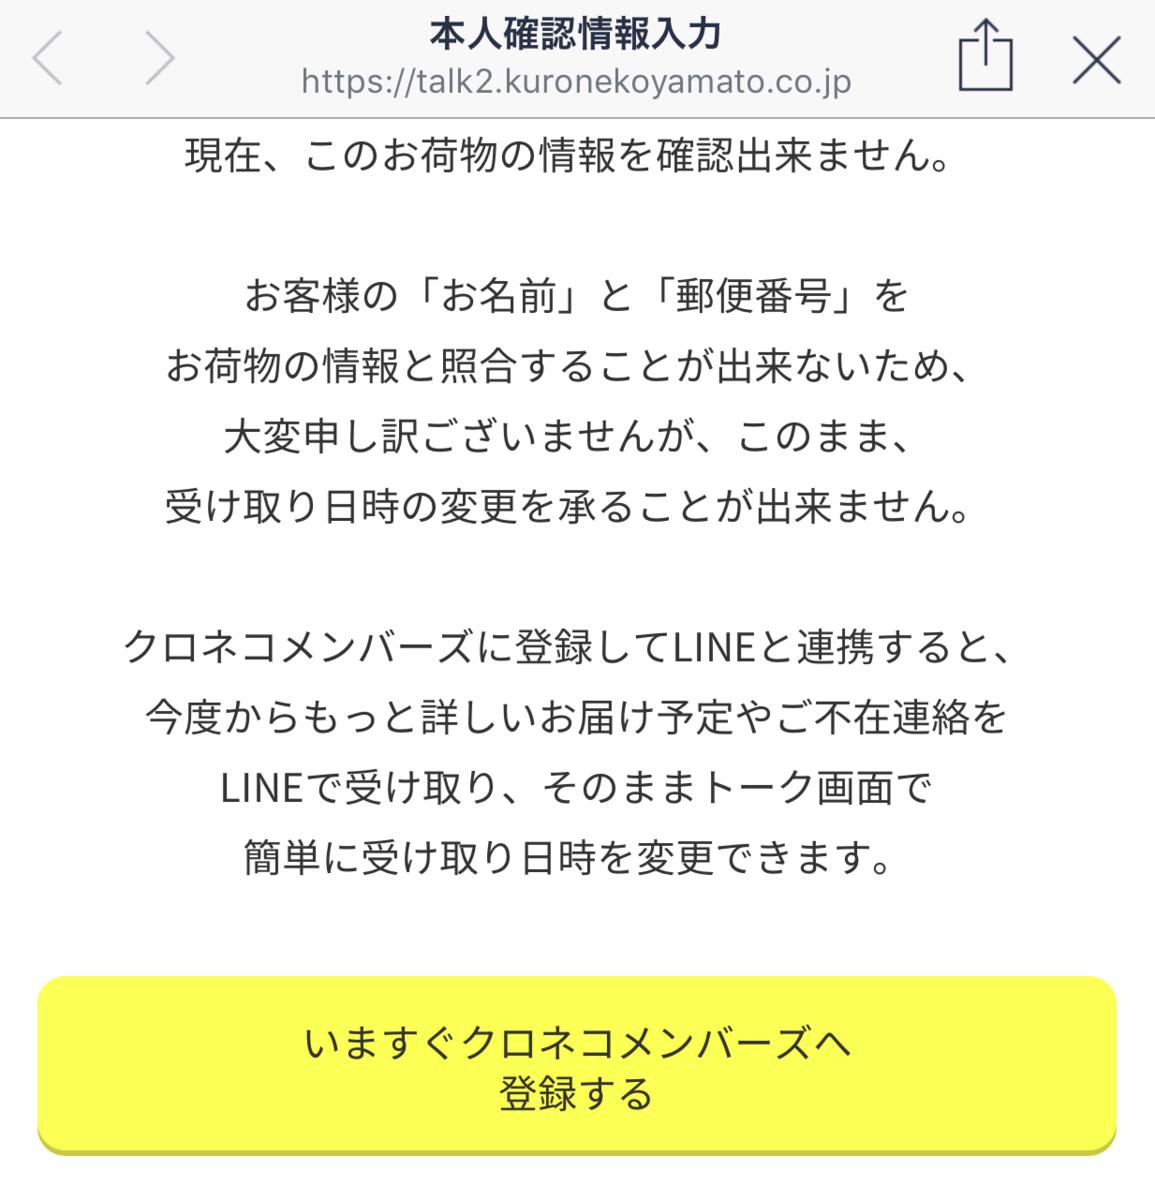 f:id:hirohito6001:20190725103911p:plain